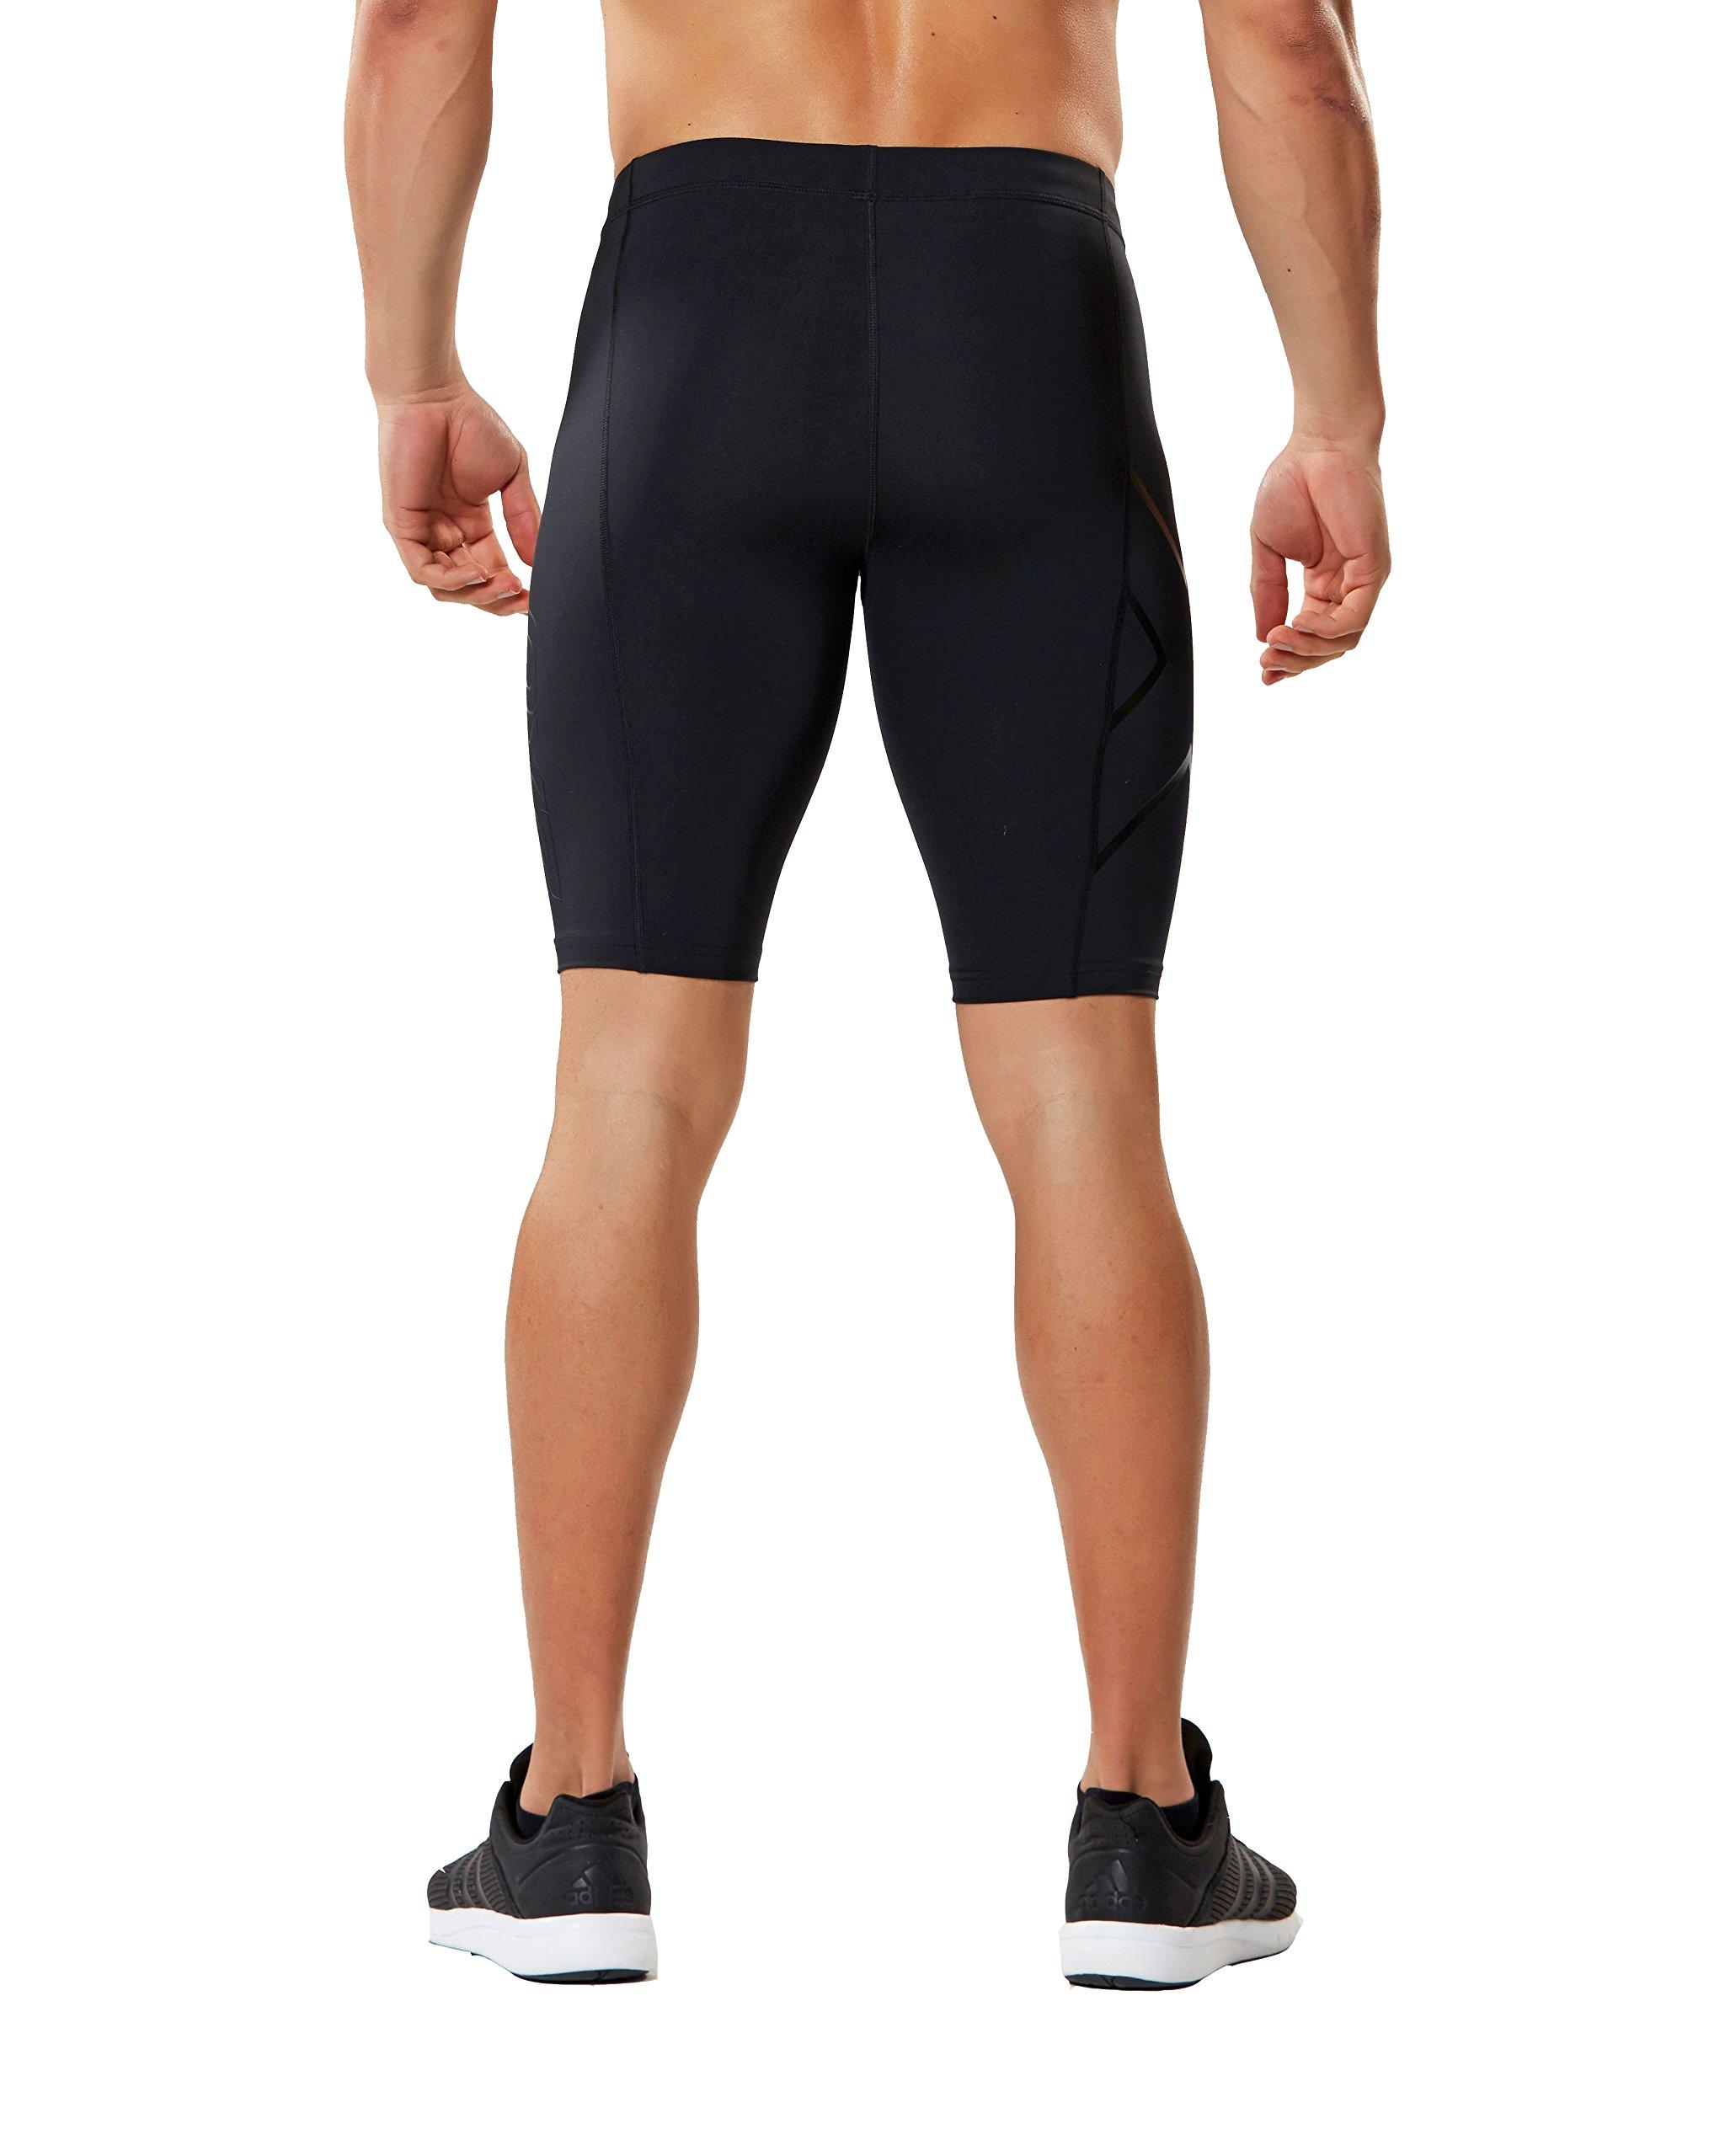 2XU Men's Core Compression Shorts, Black/Nero, Medium by 2XU (Image #3)